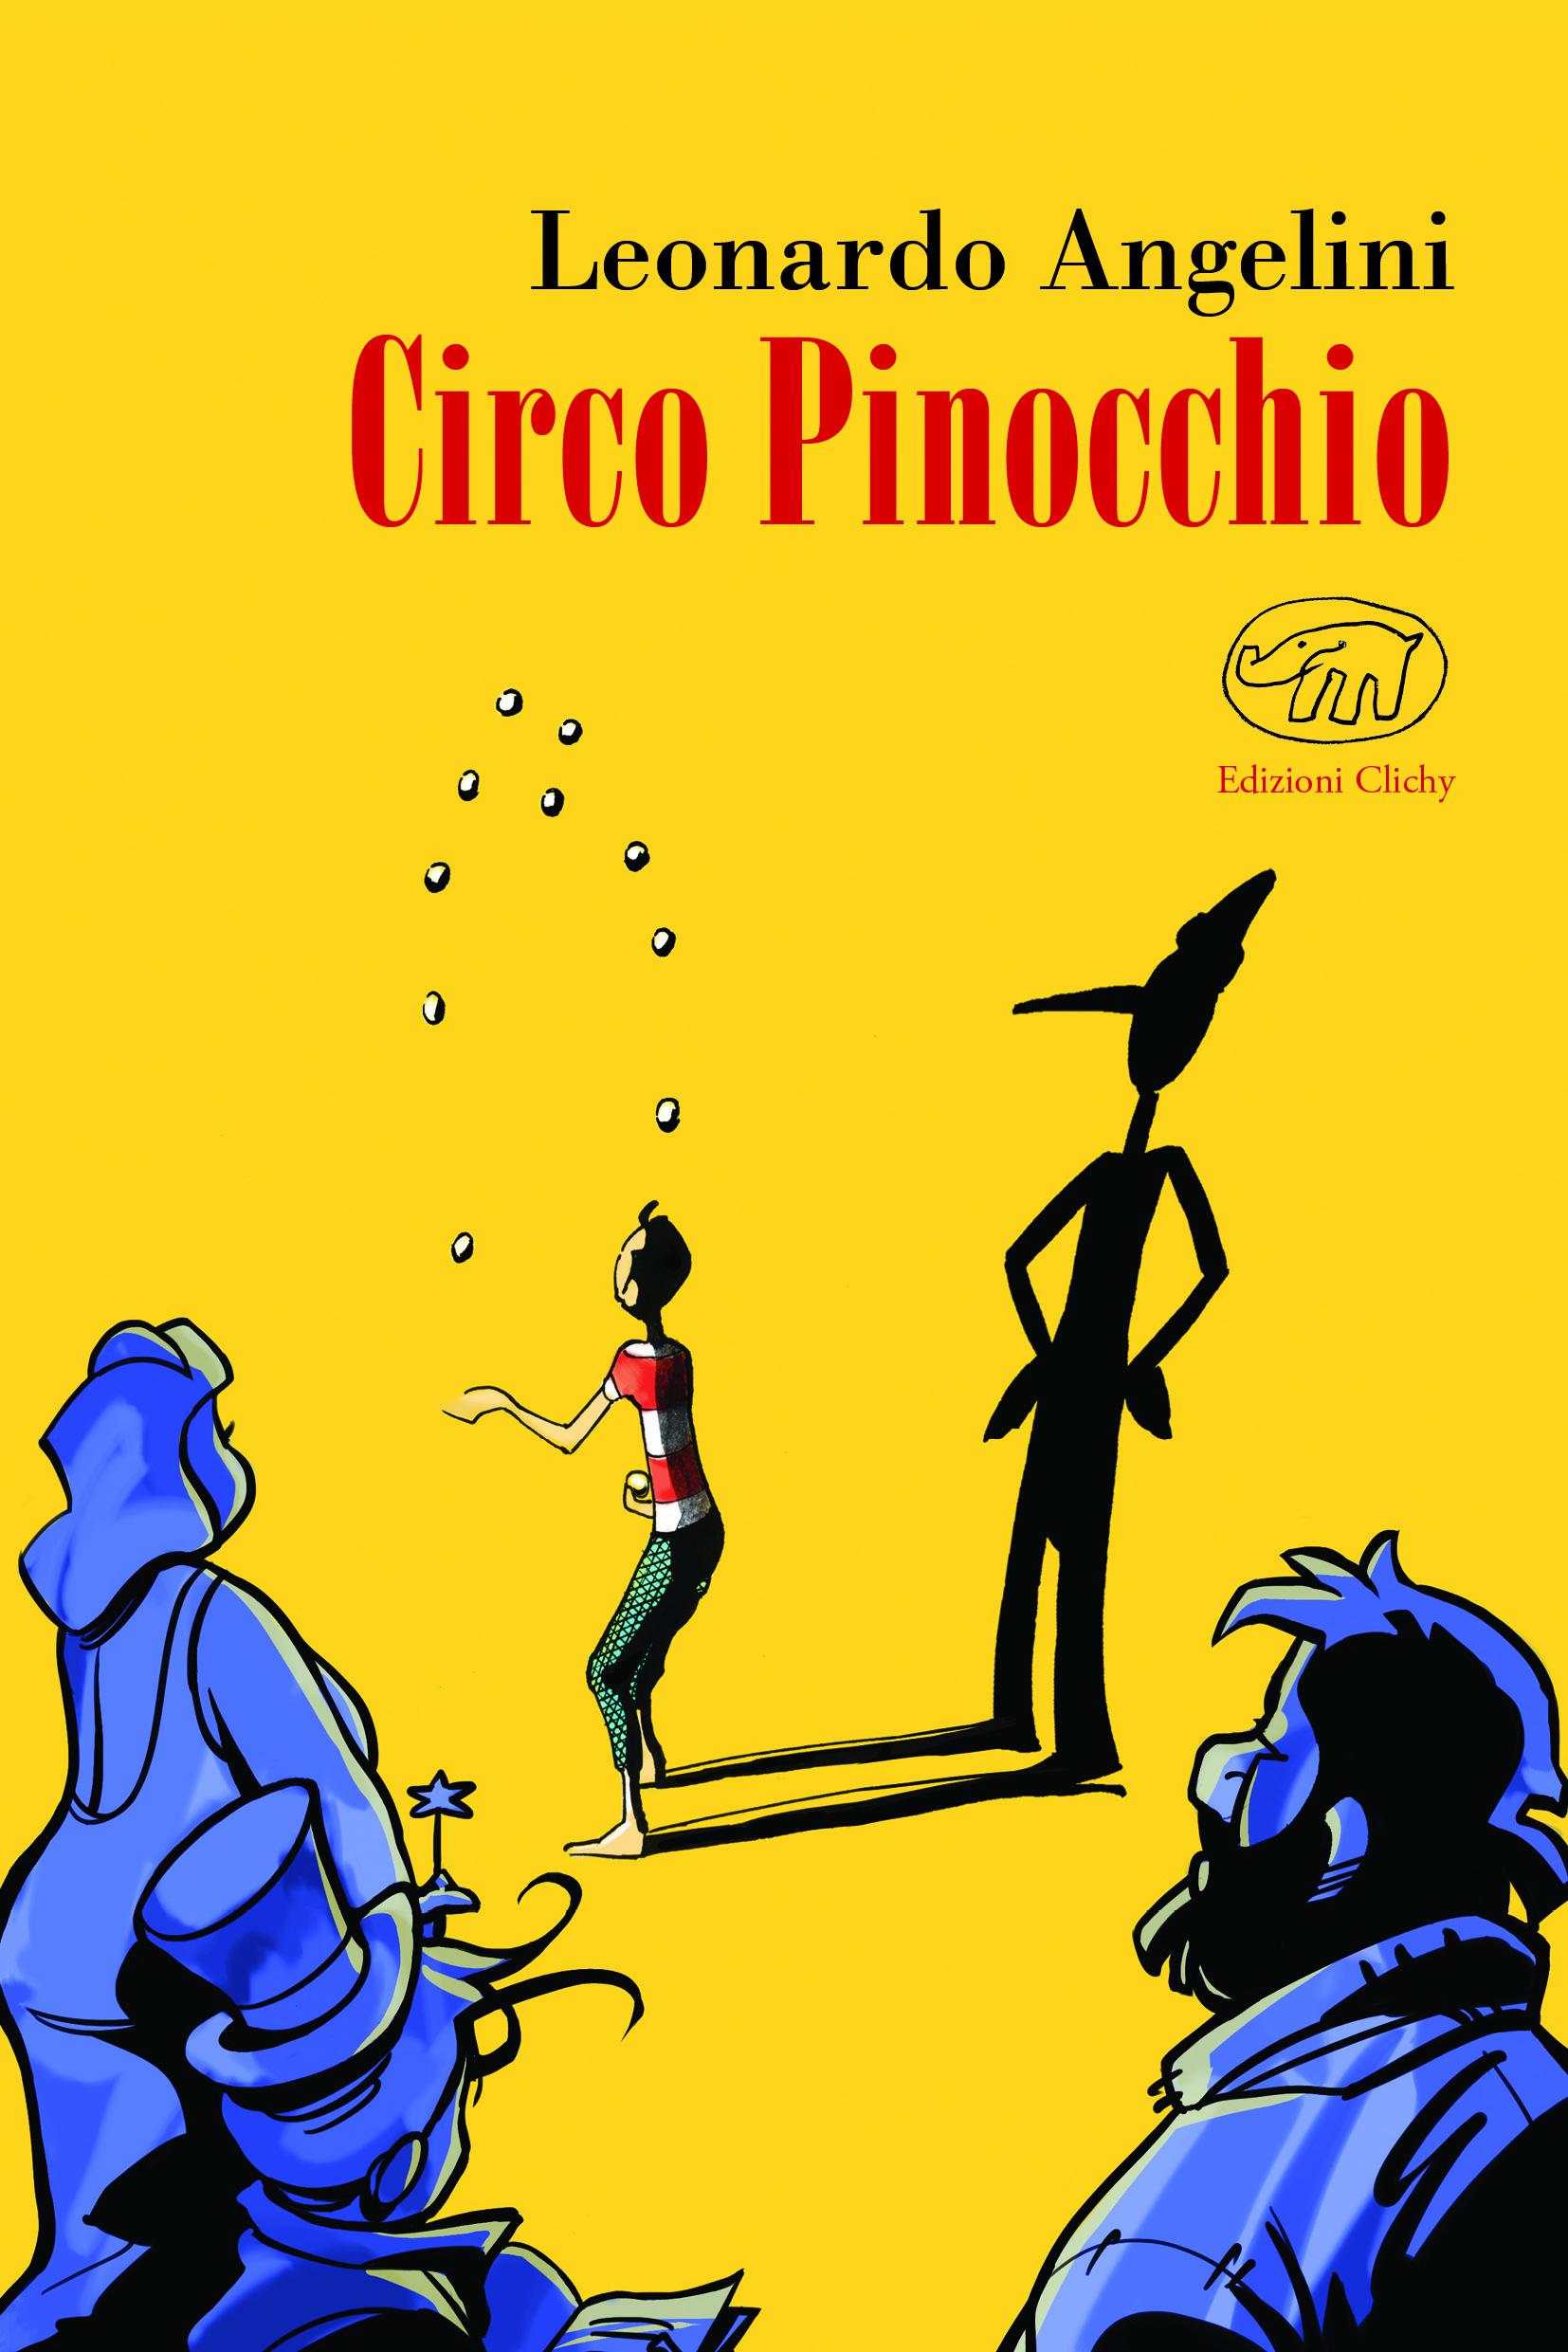 Circo Pinocchio